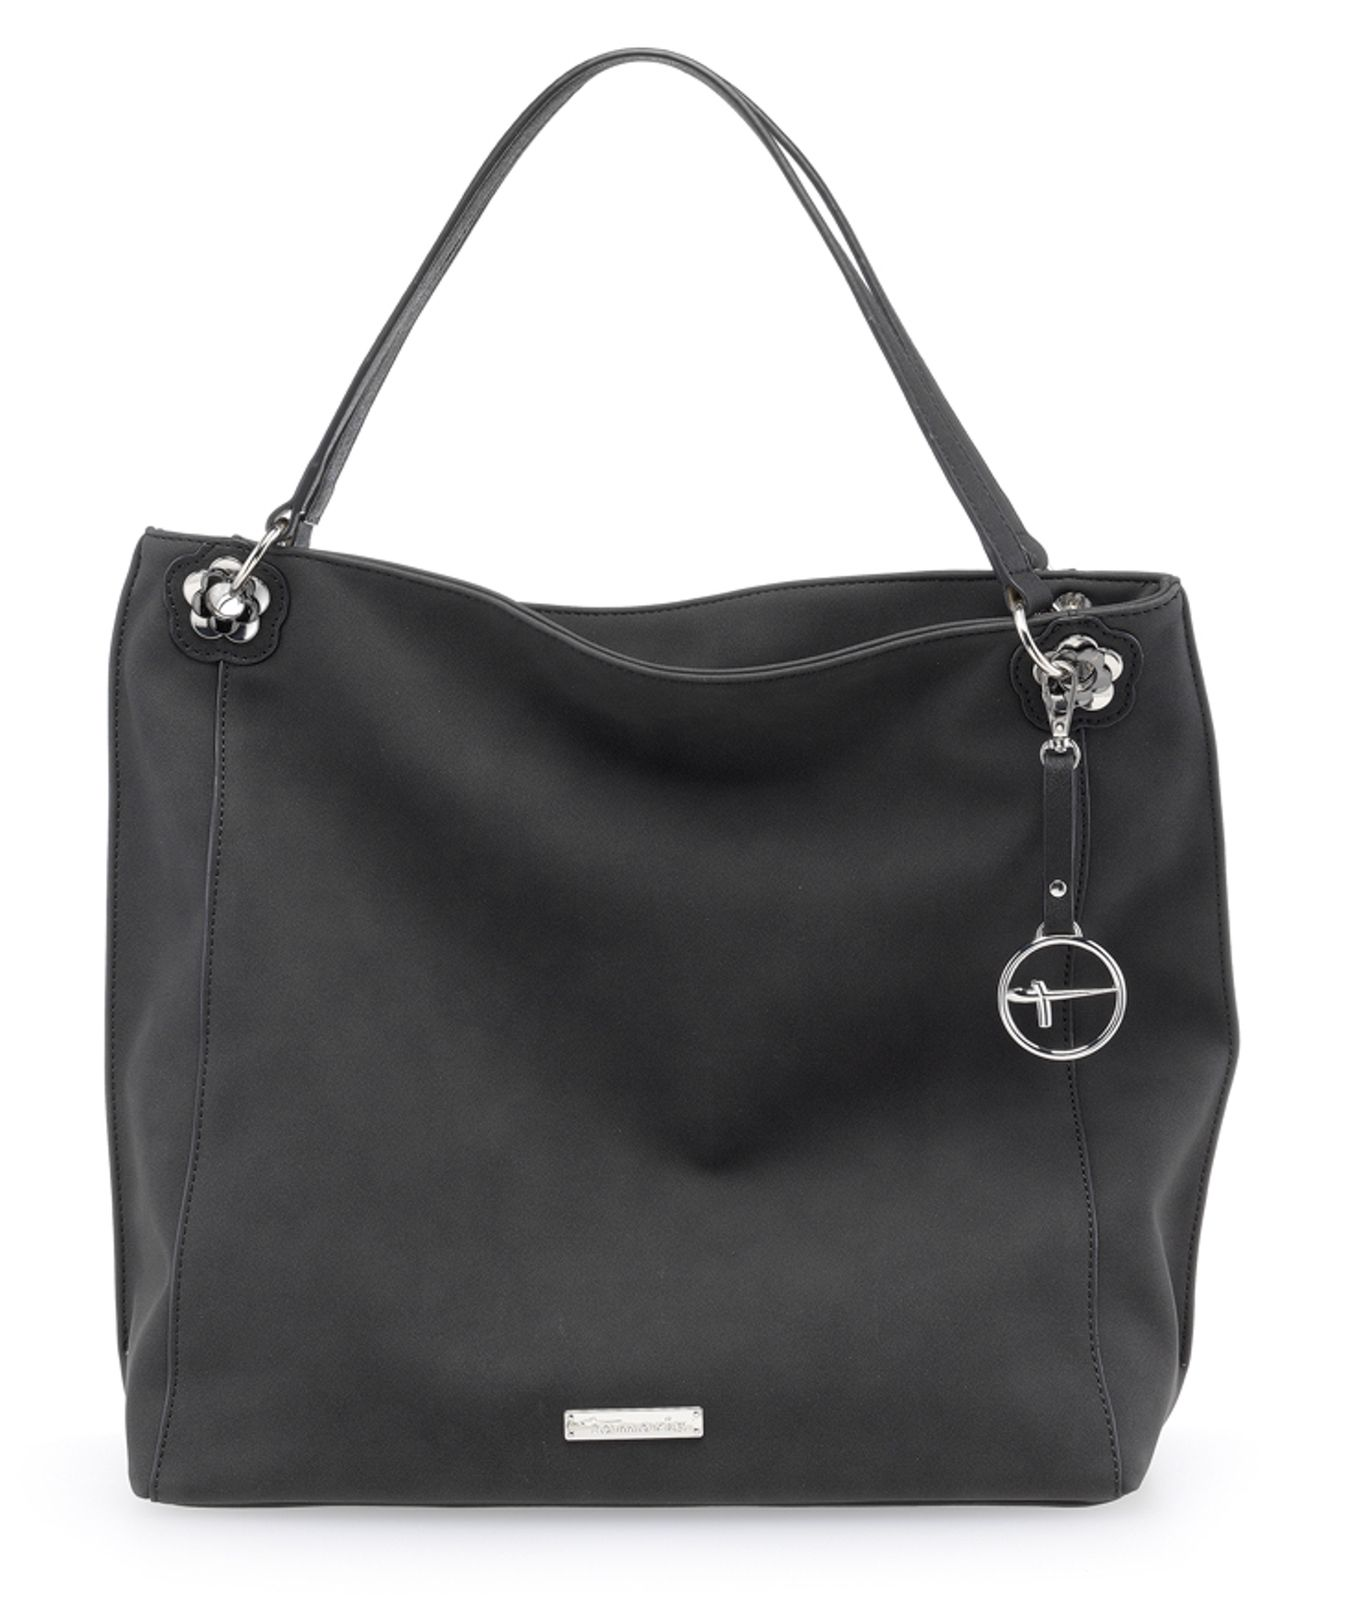 Tamaris Olympia Shopping Bag Black Comb.